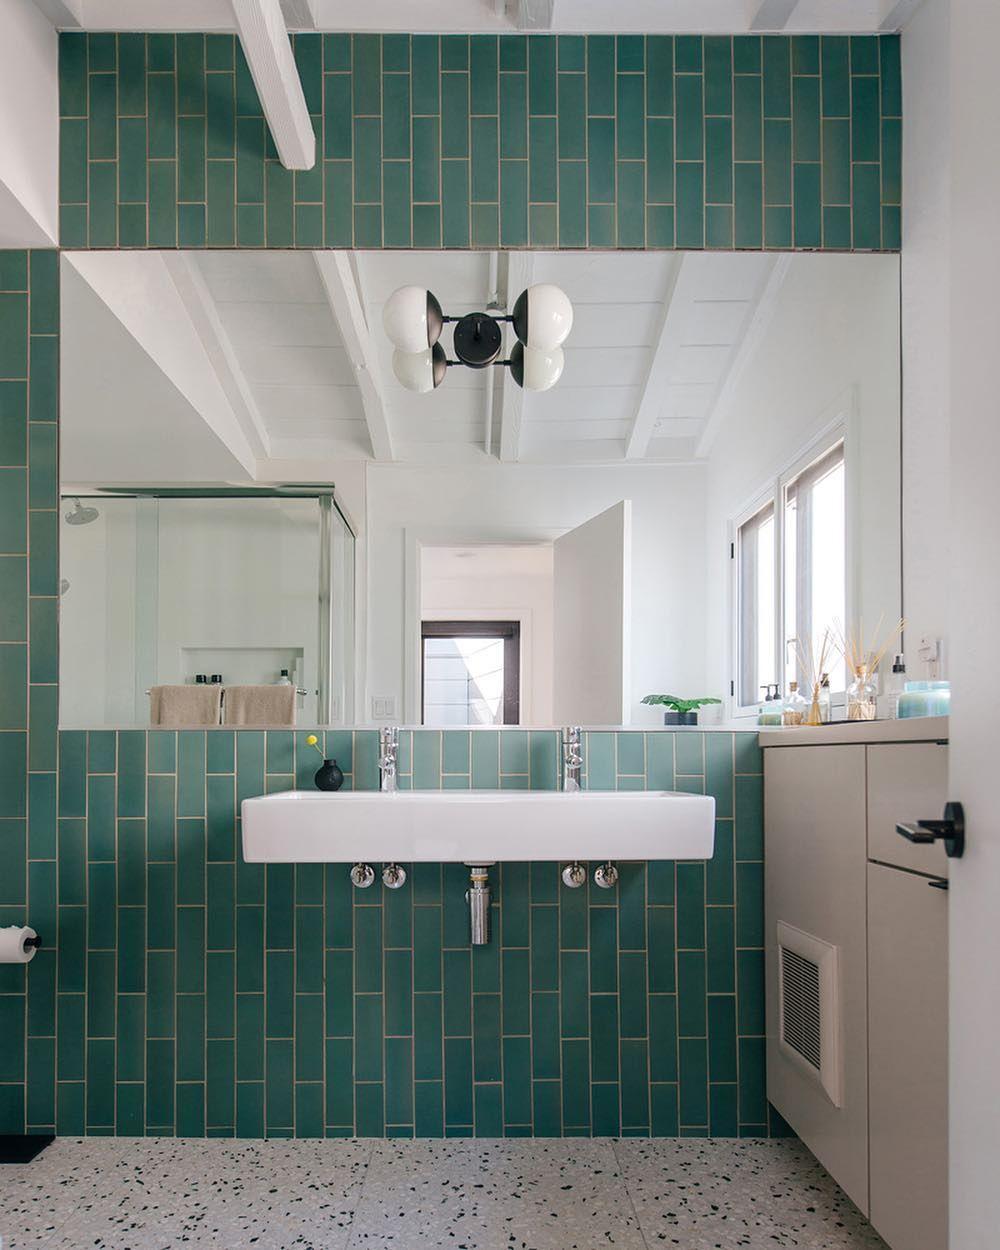 Cathy Robin At Heath On Instagram Our Latest Favorite From Tilemakestheroom Our Tile In Kpfa Green A Classic Bathroom Design Bath Design Creative Bath